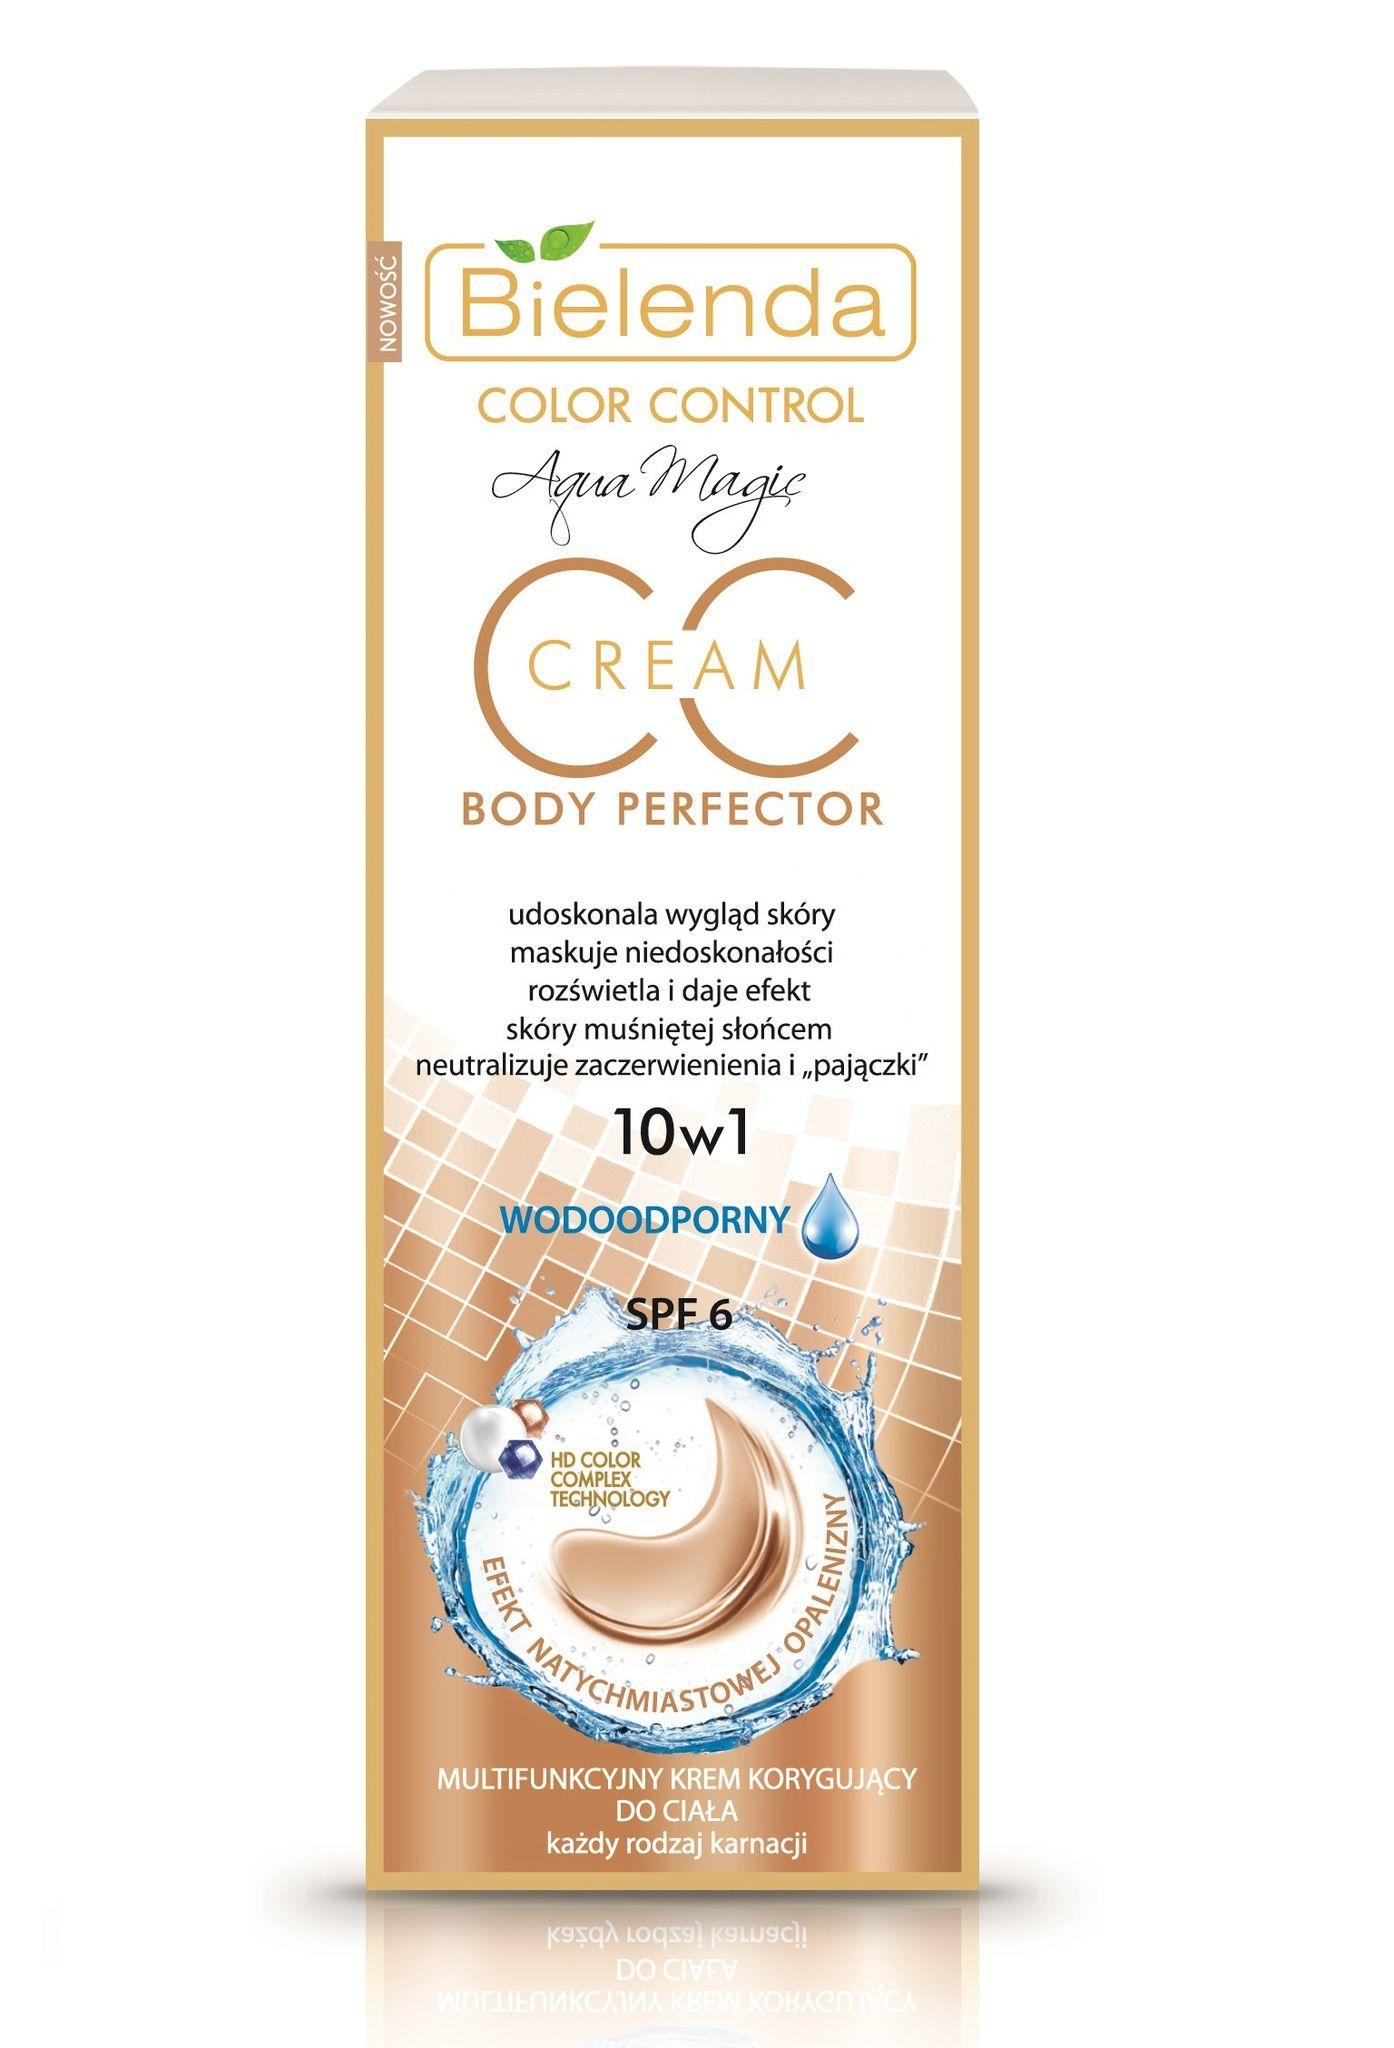 Multifunctional characterwise cream for body (water repellent) 10b1 , BIELENDA , 175ml